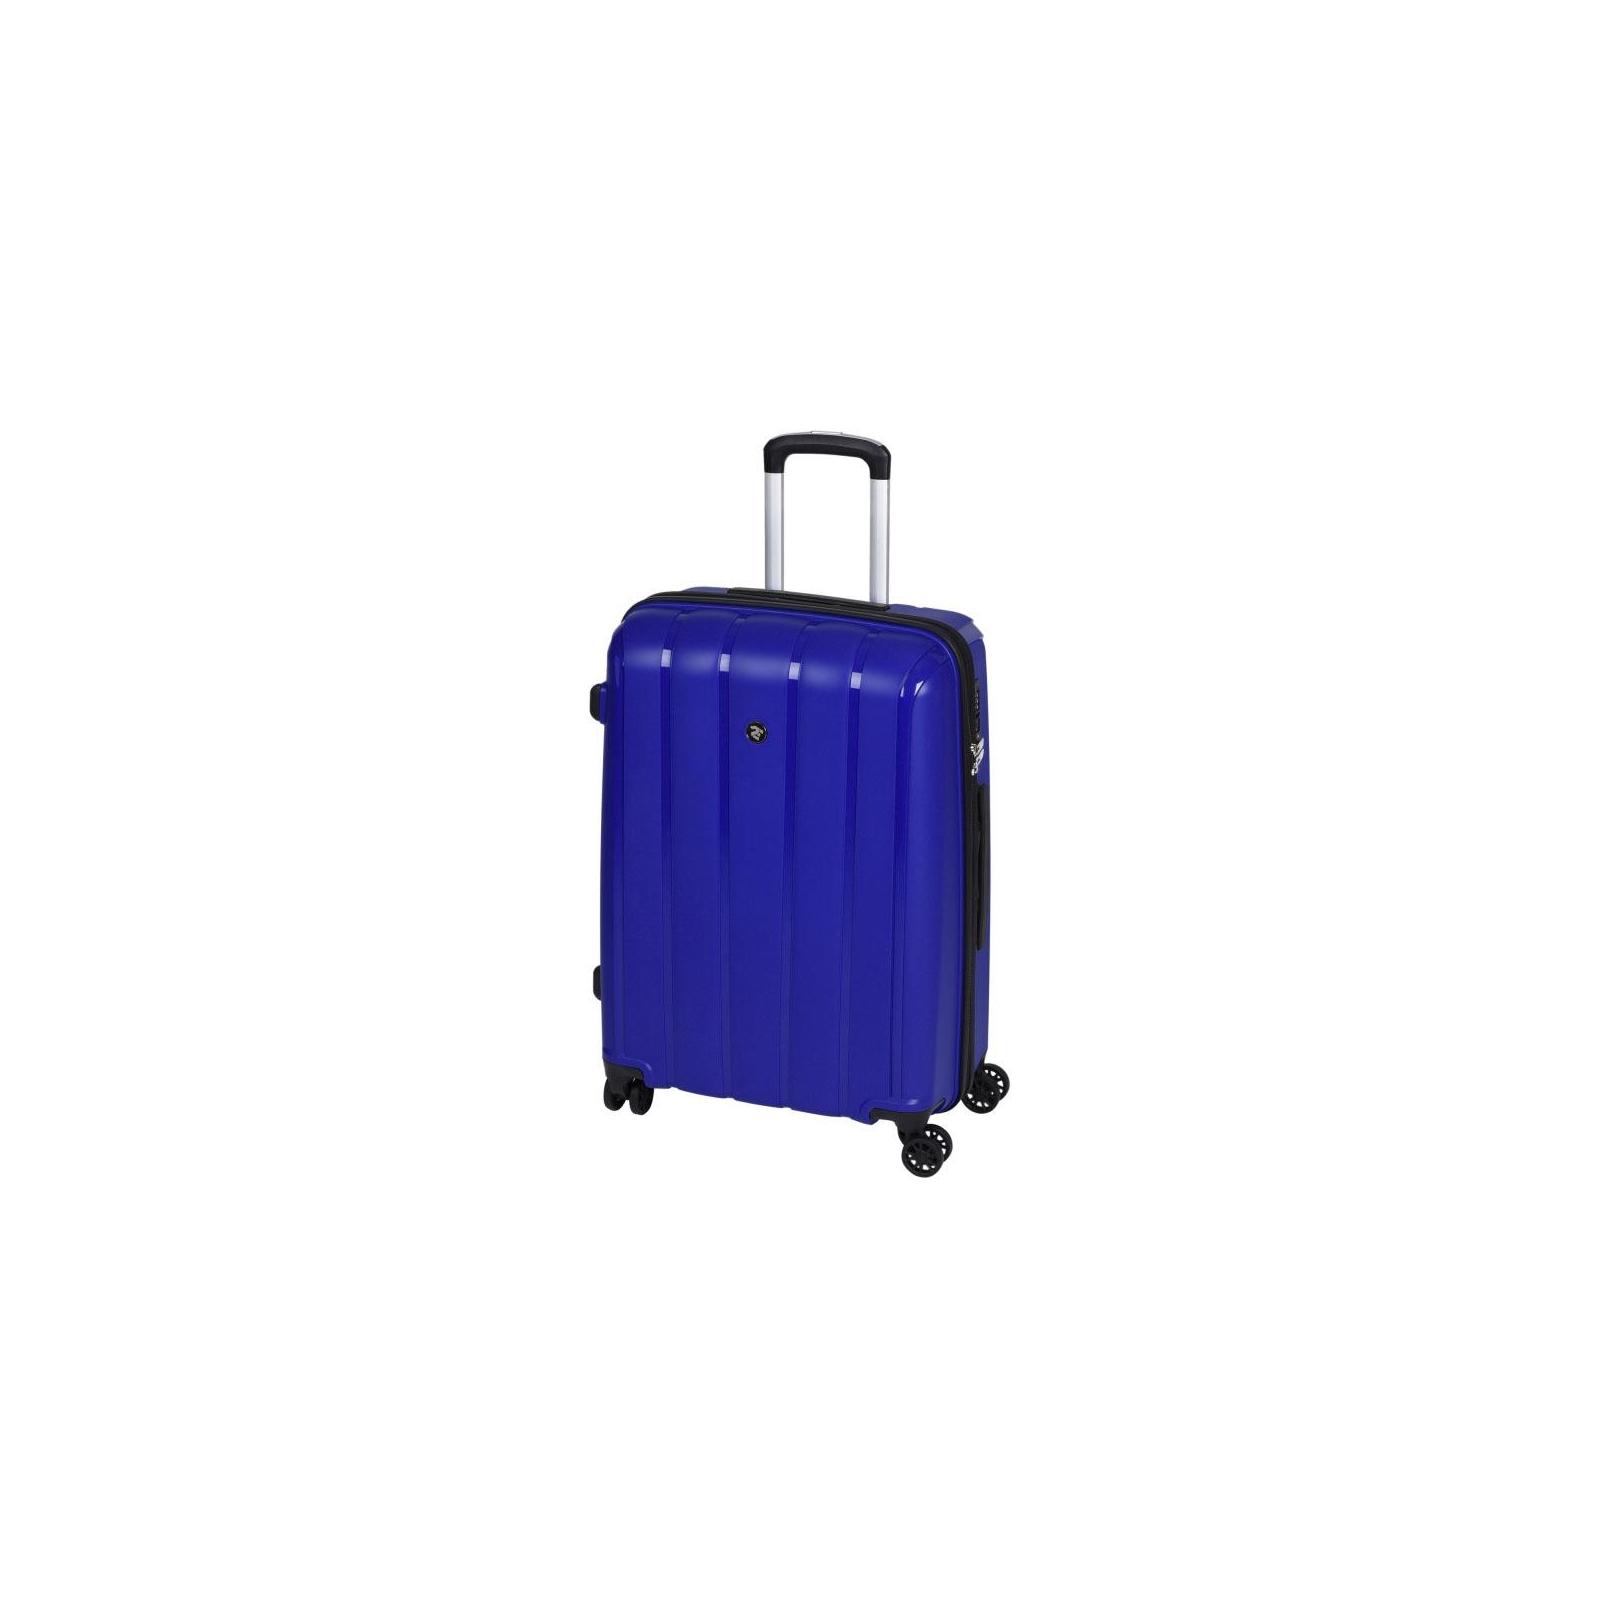 Чемодан 2E Youngster средний синий (2E-SPPY-M-NV)